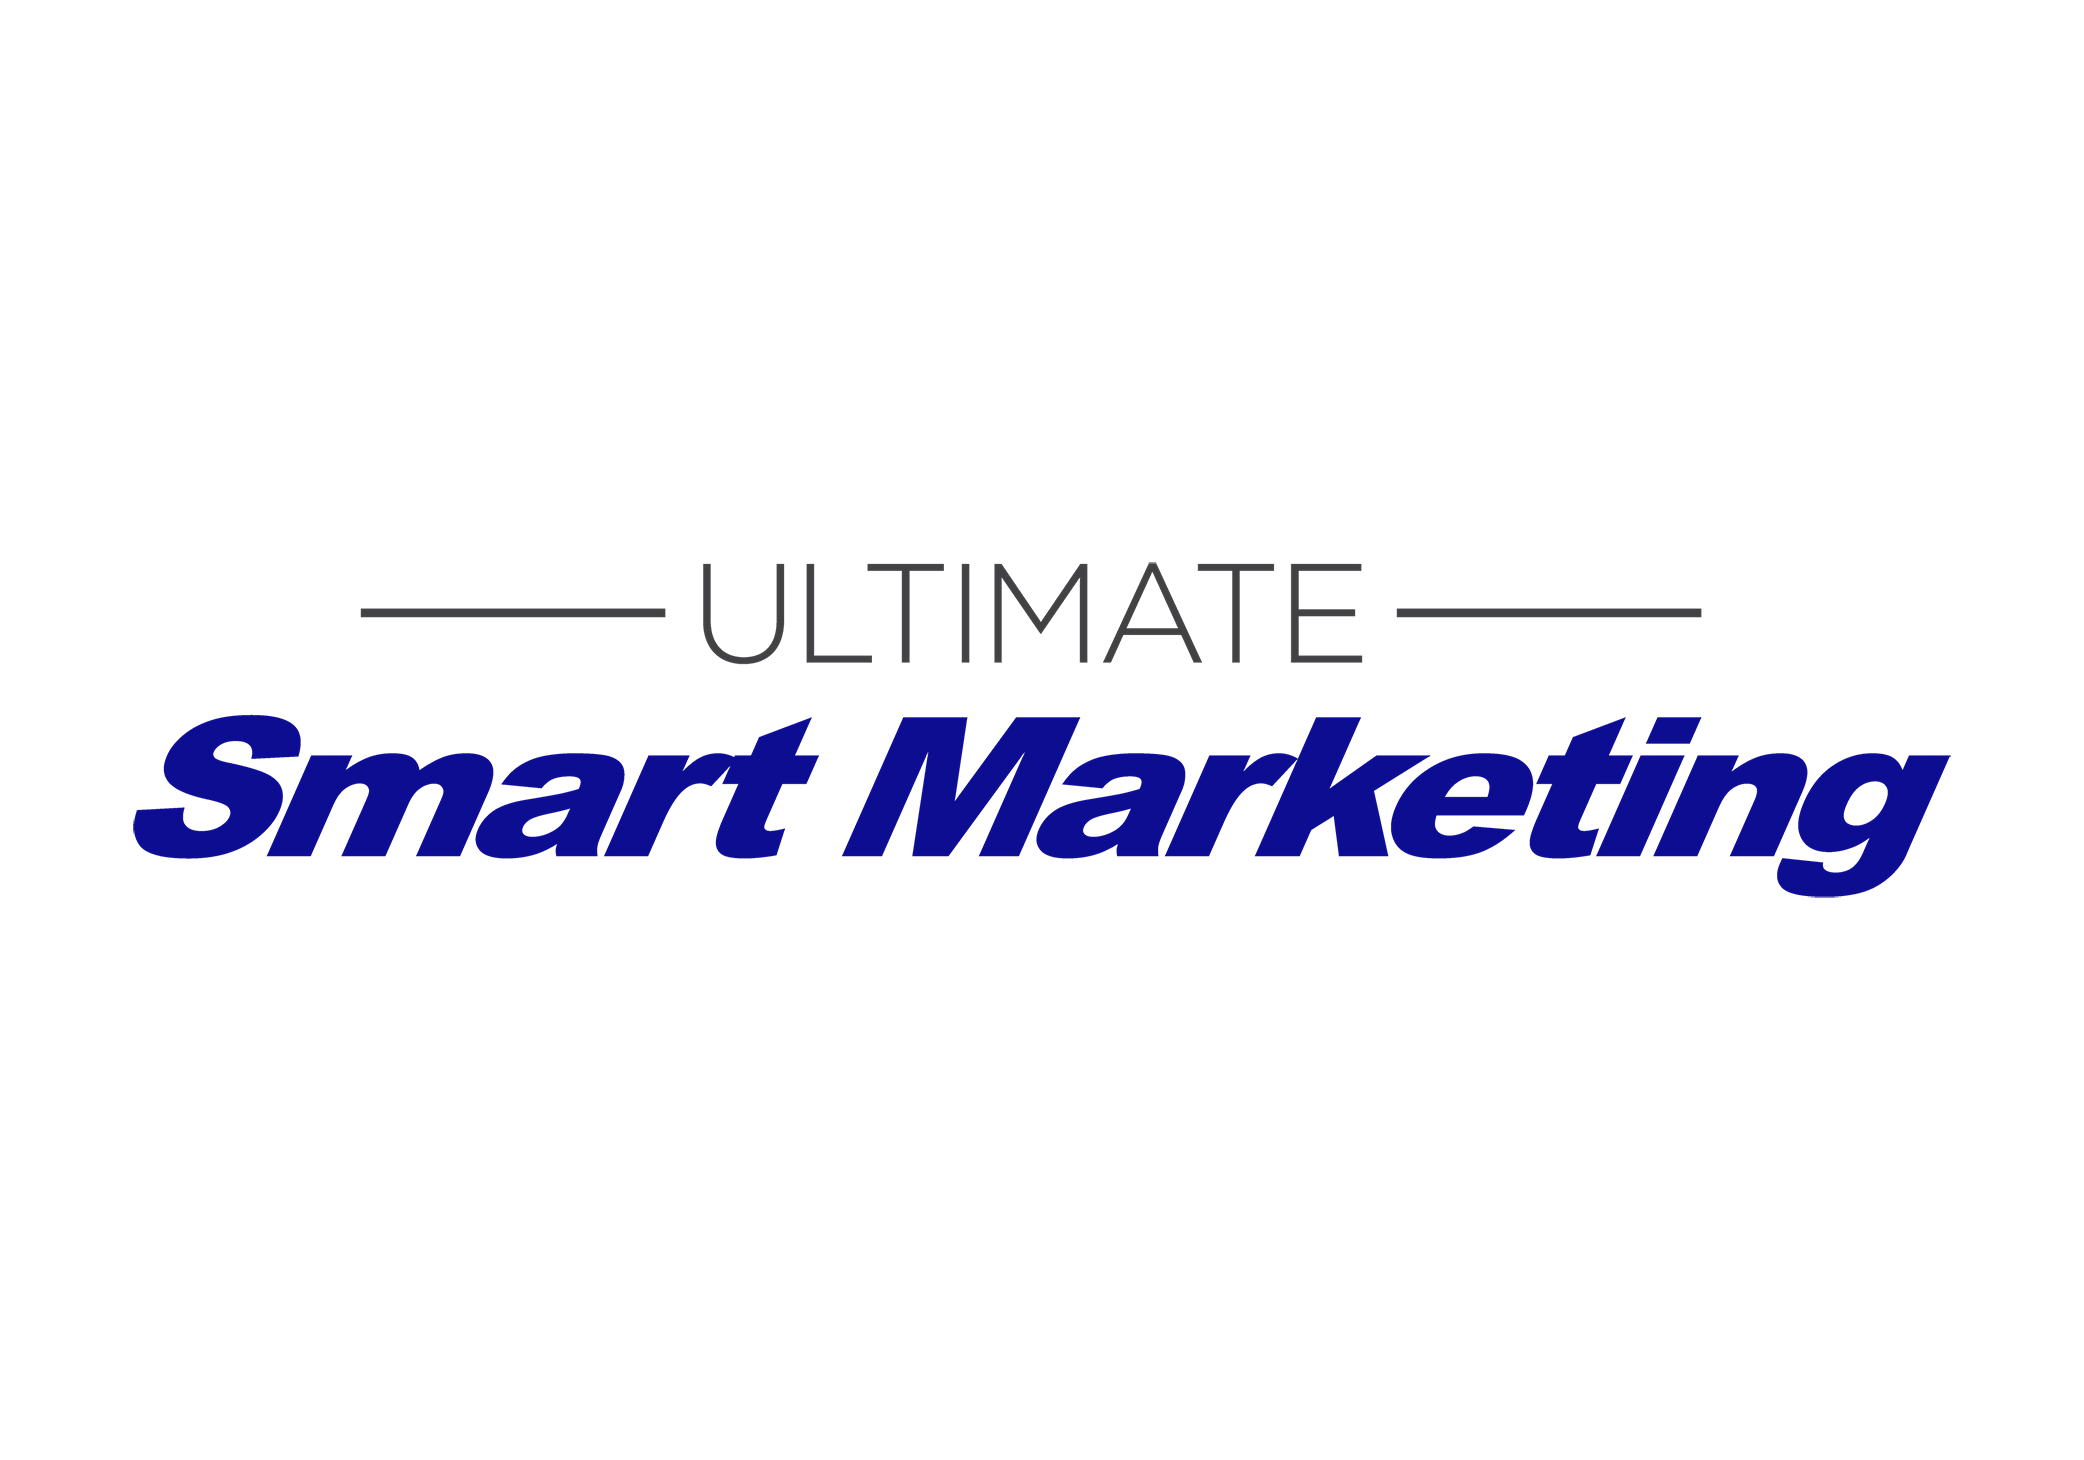 Ultimate Smart Marketing